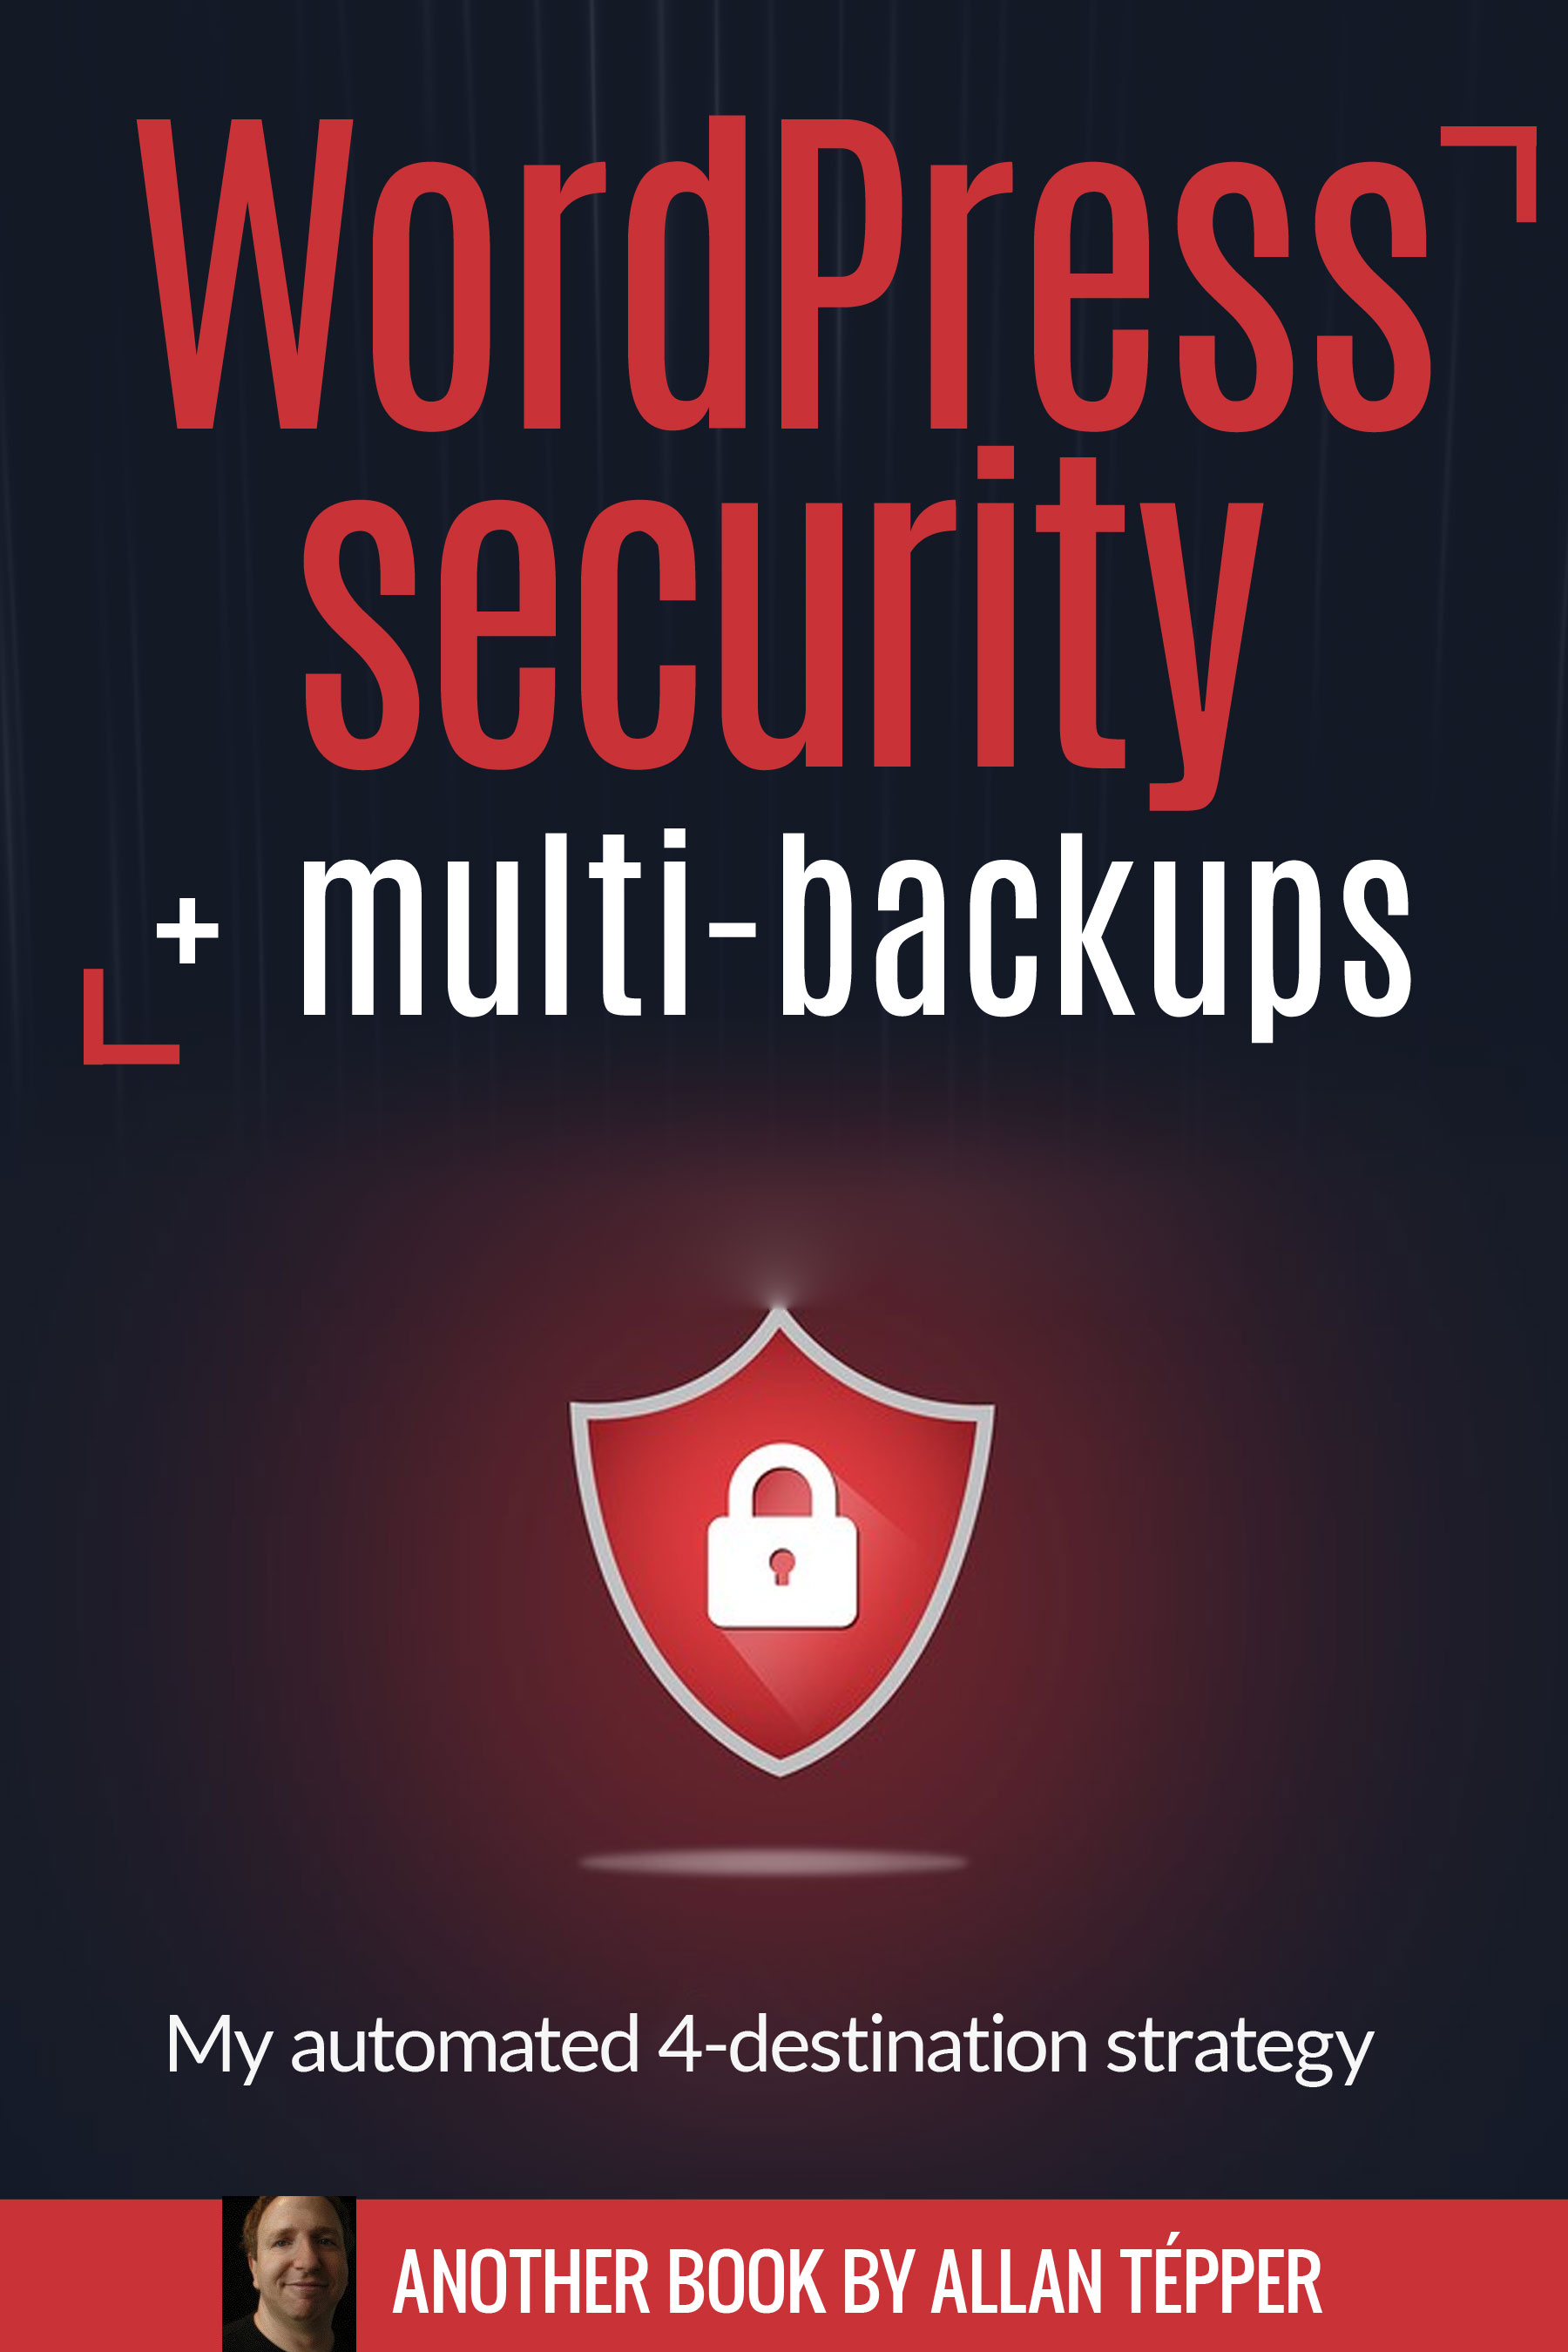 WordPress security + multi-backups—free ebook until this Sunday 4